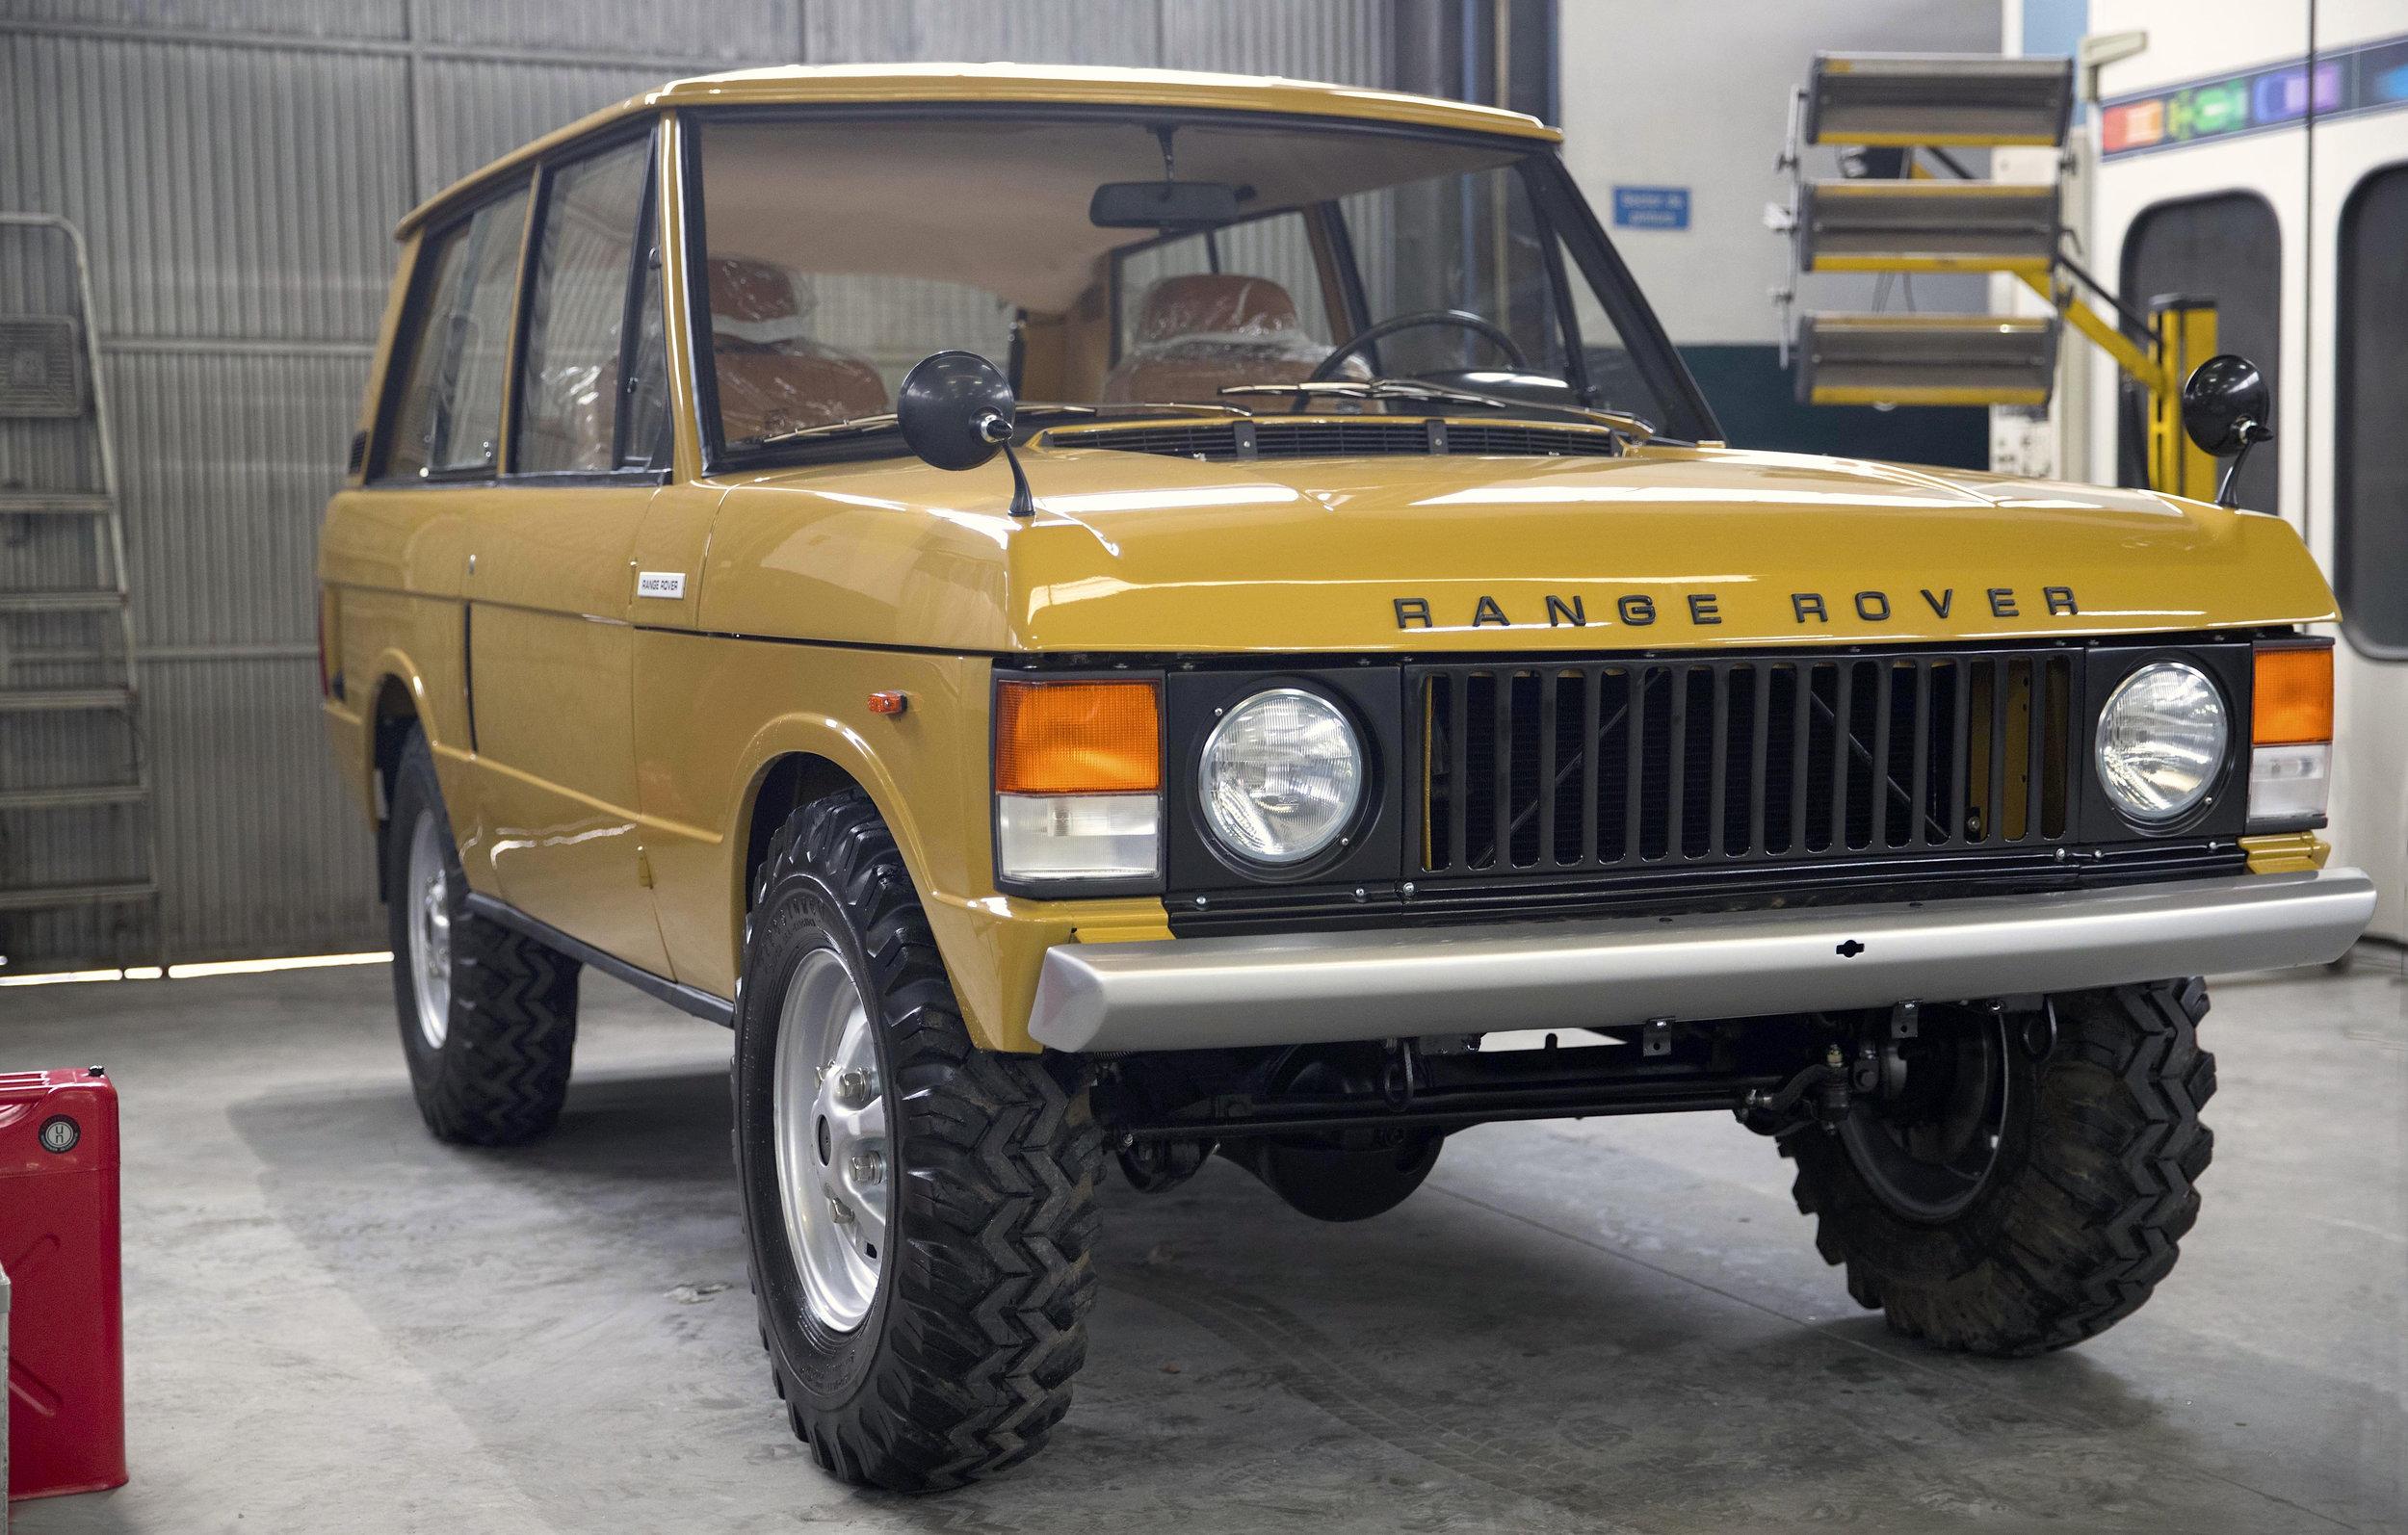 LegacyOverland_1973_RangeRover_shop4.jpg